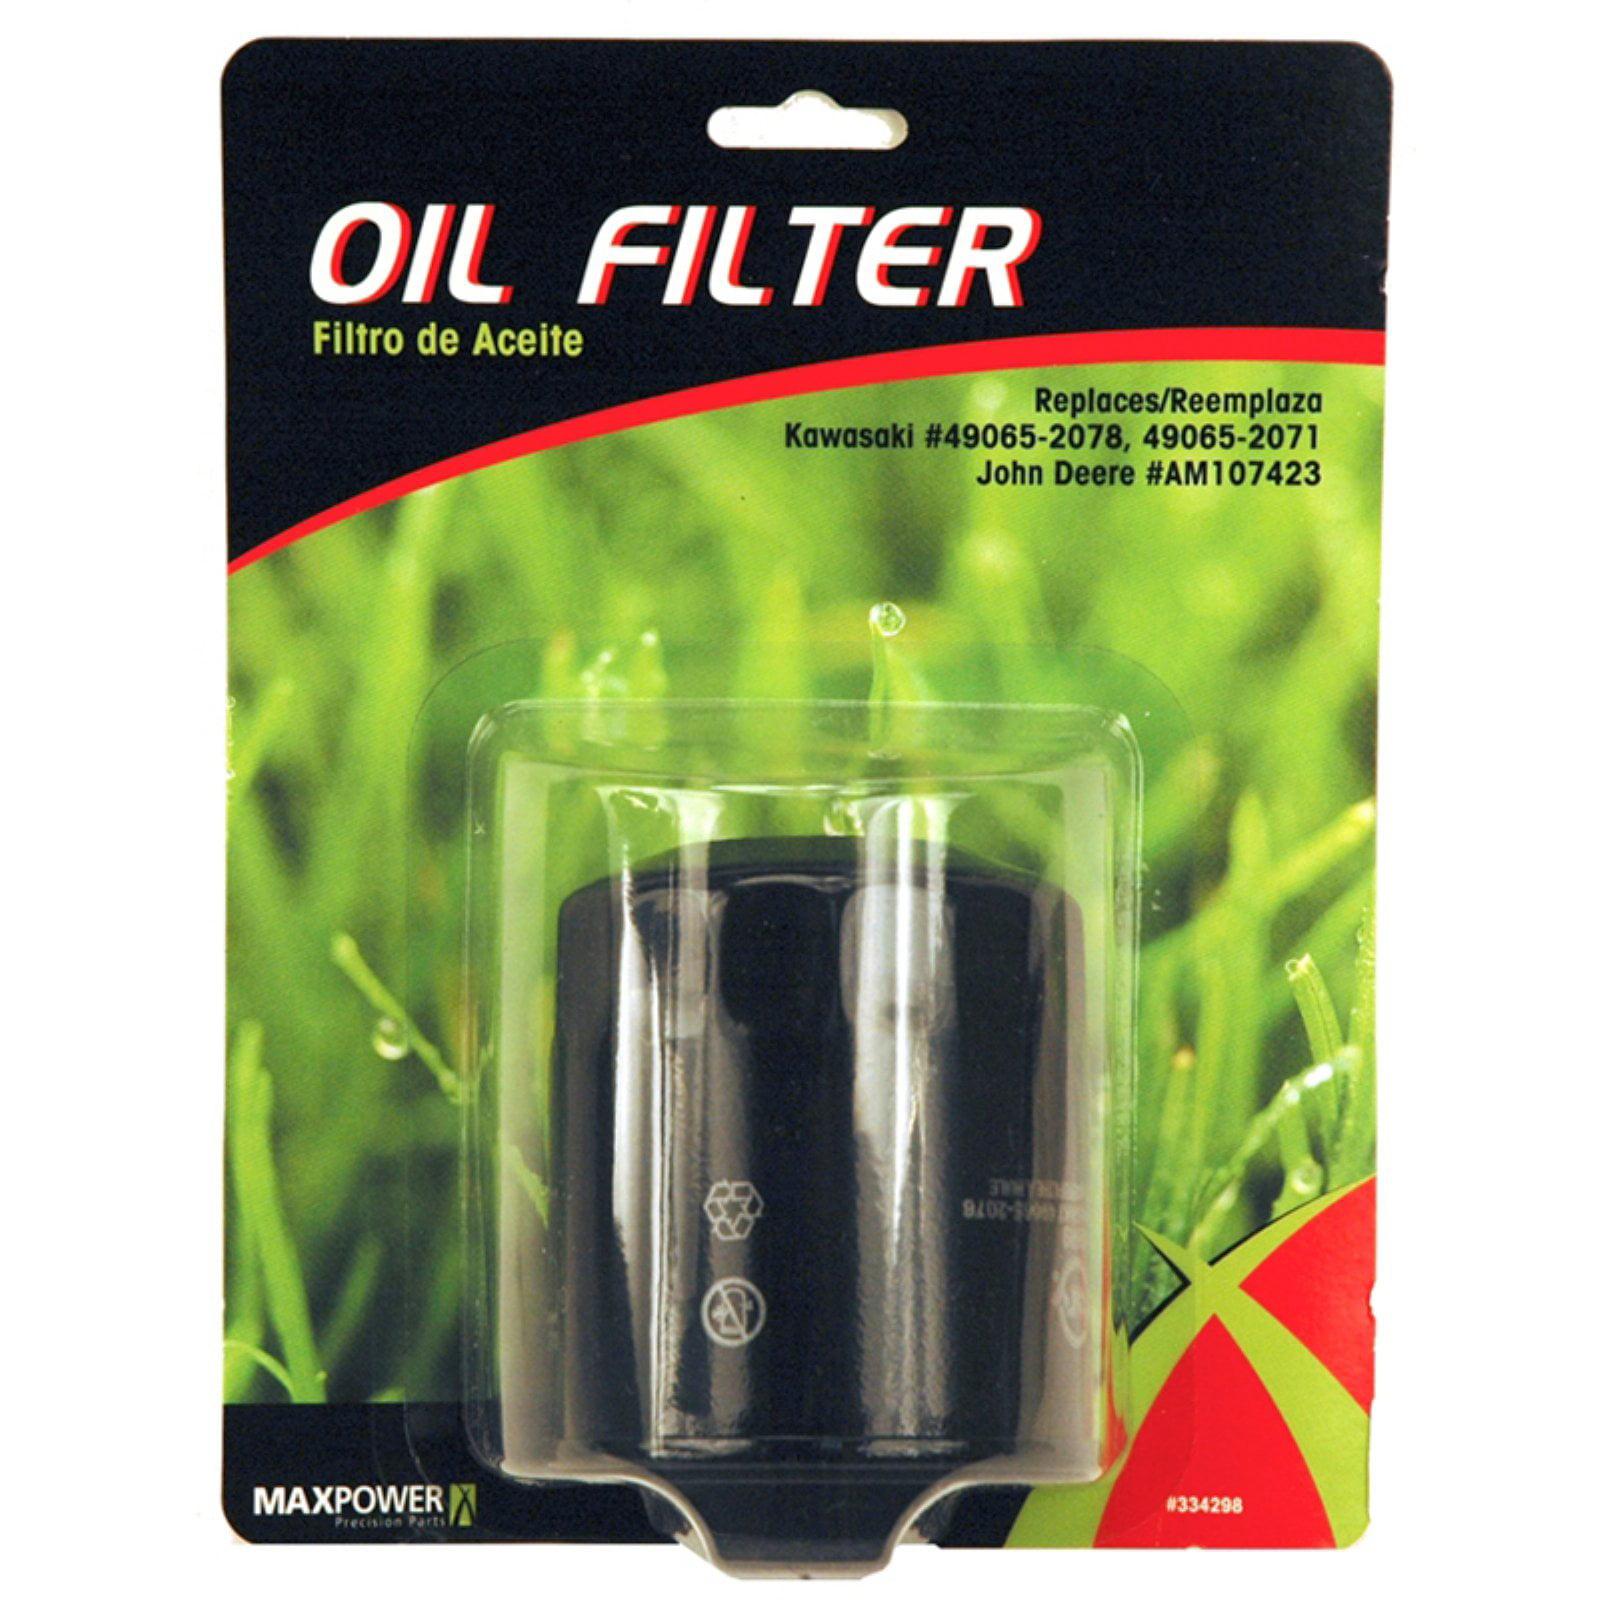 Maxpower 334298 Oil Filter For Kawasaki